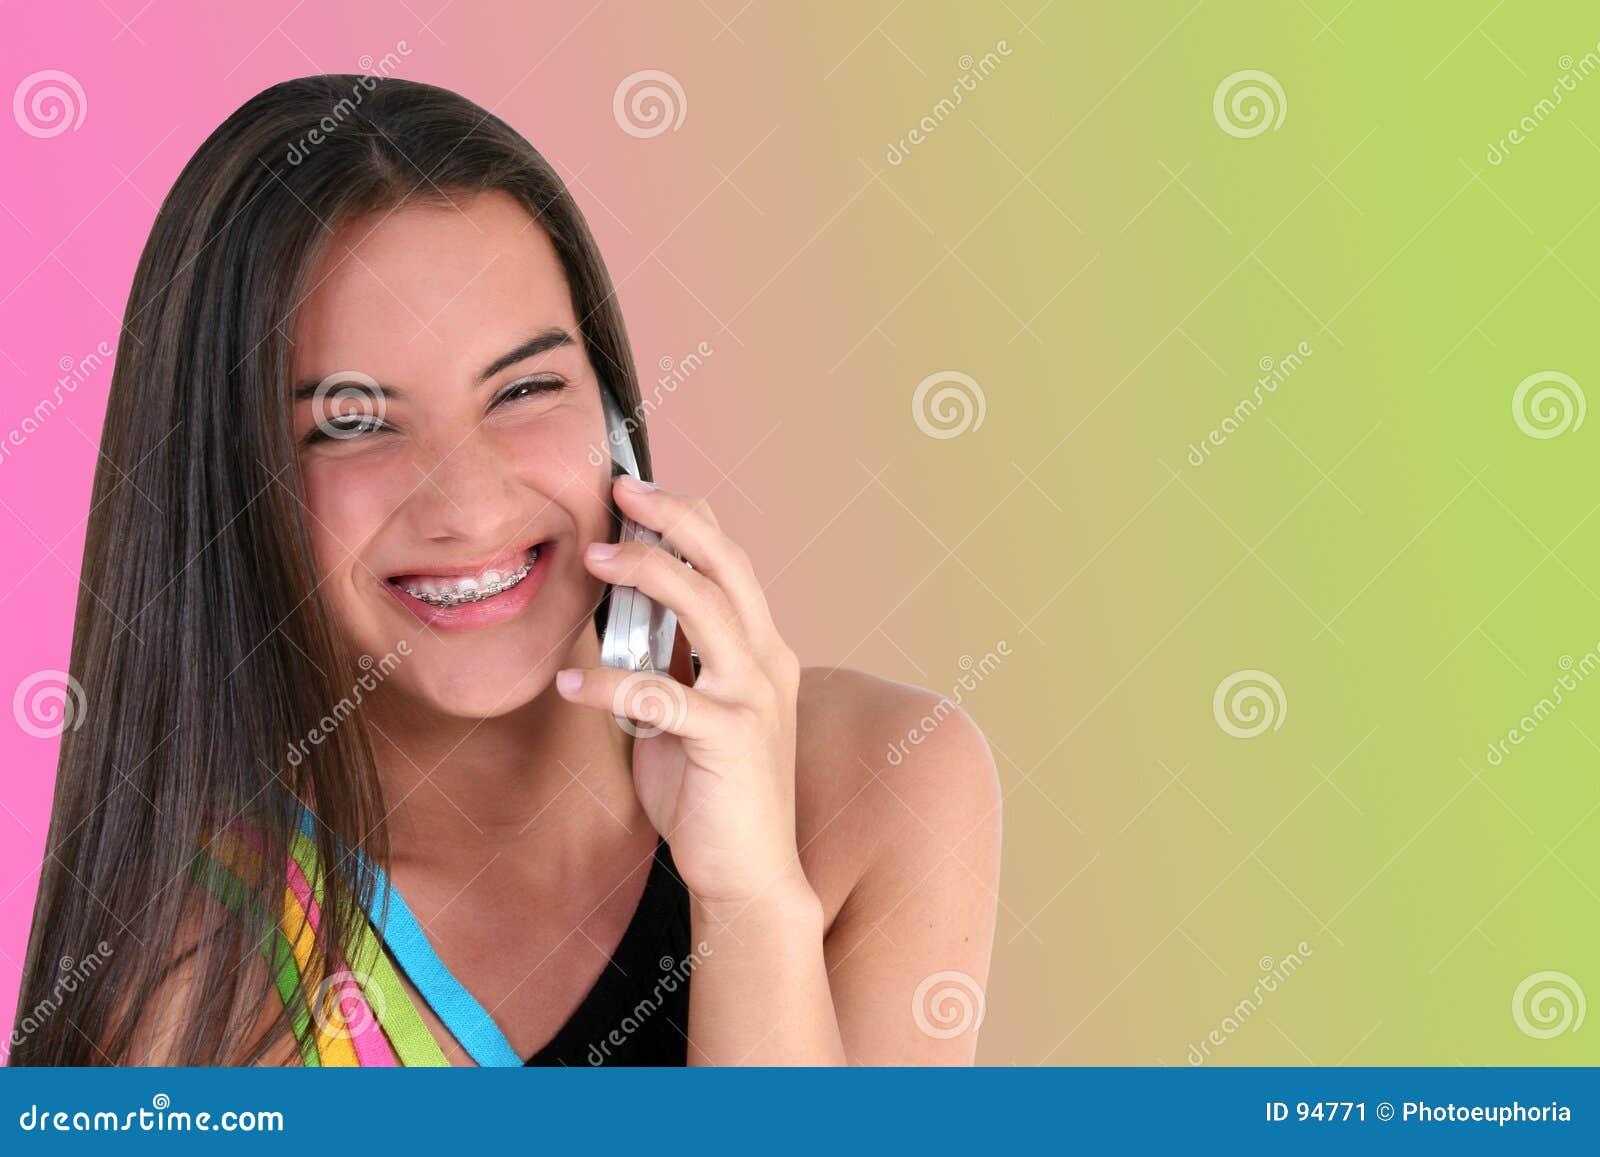 Adolescente bonito com telemóvel